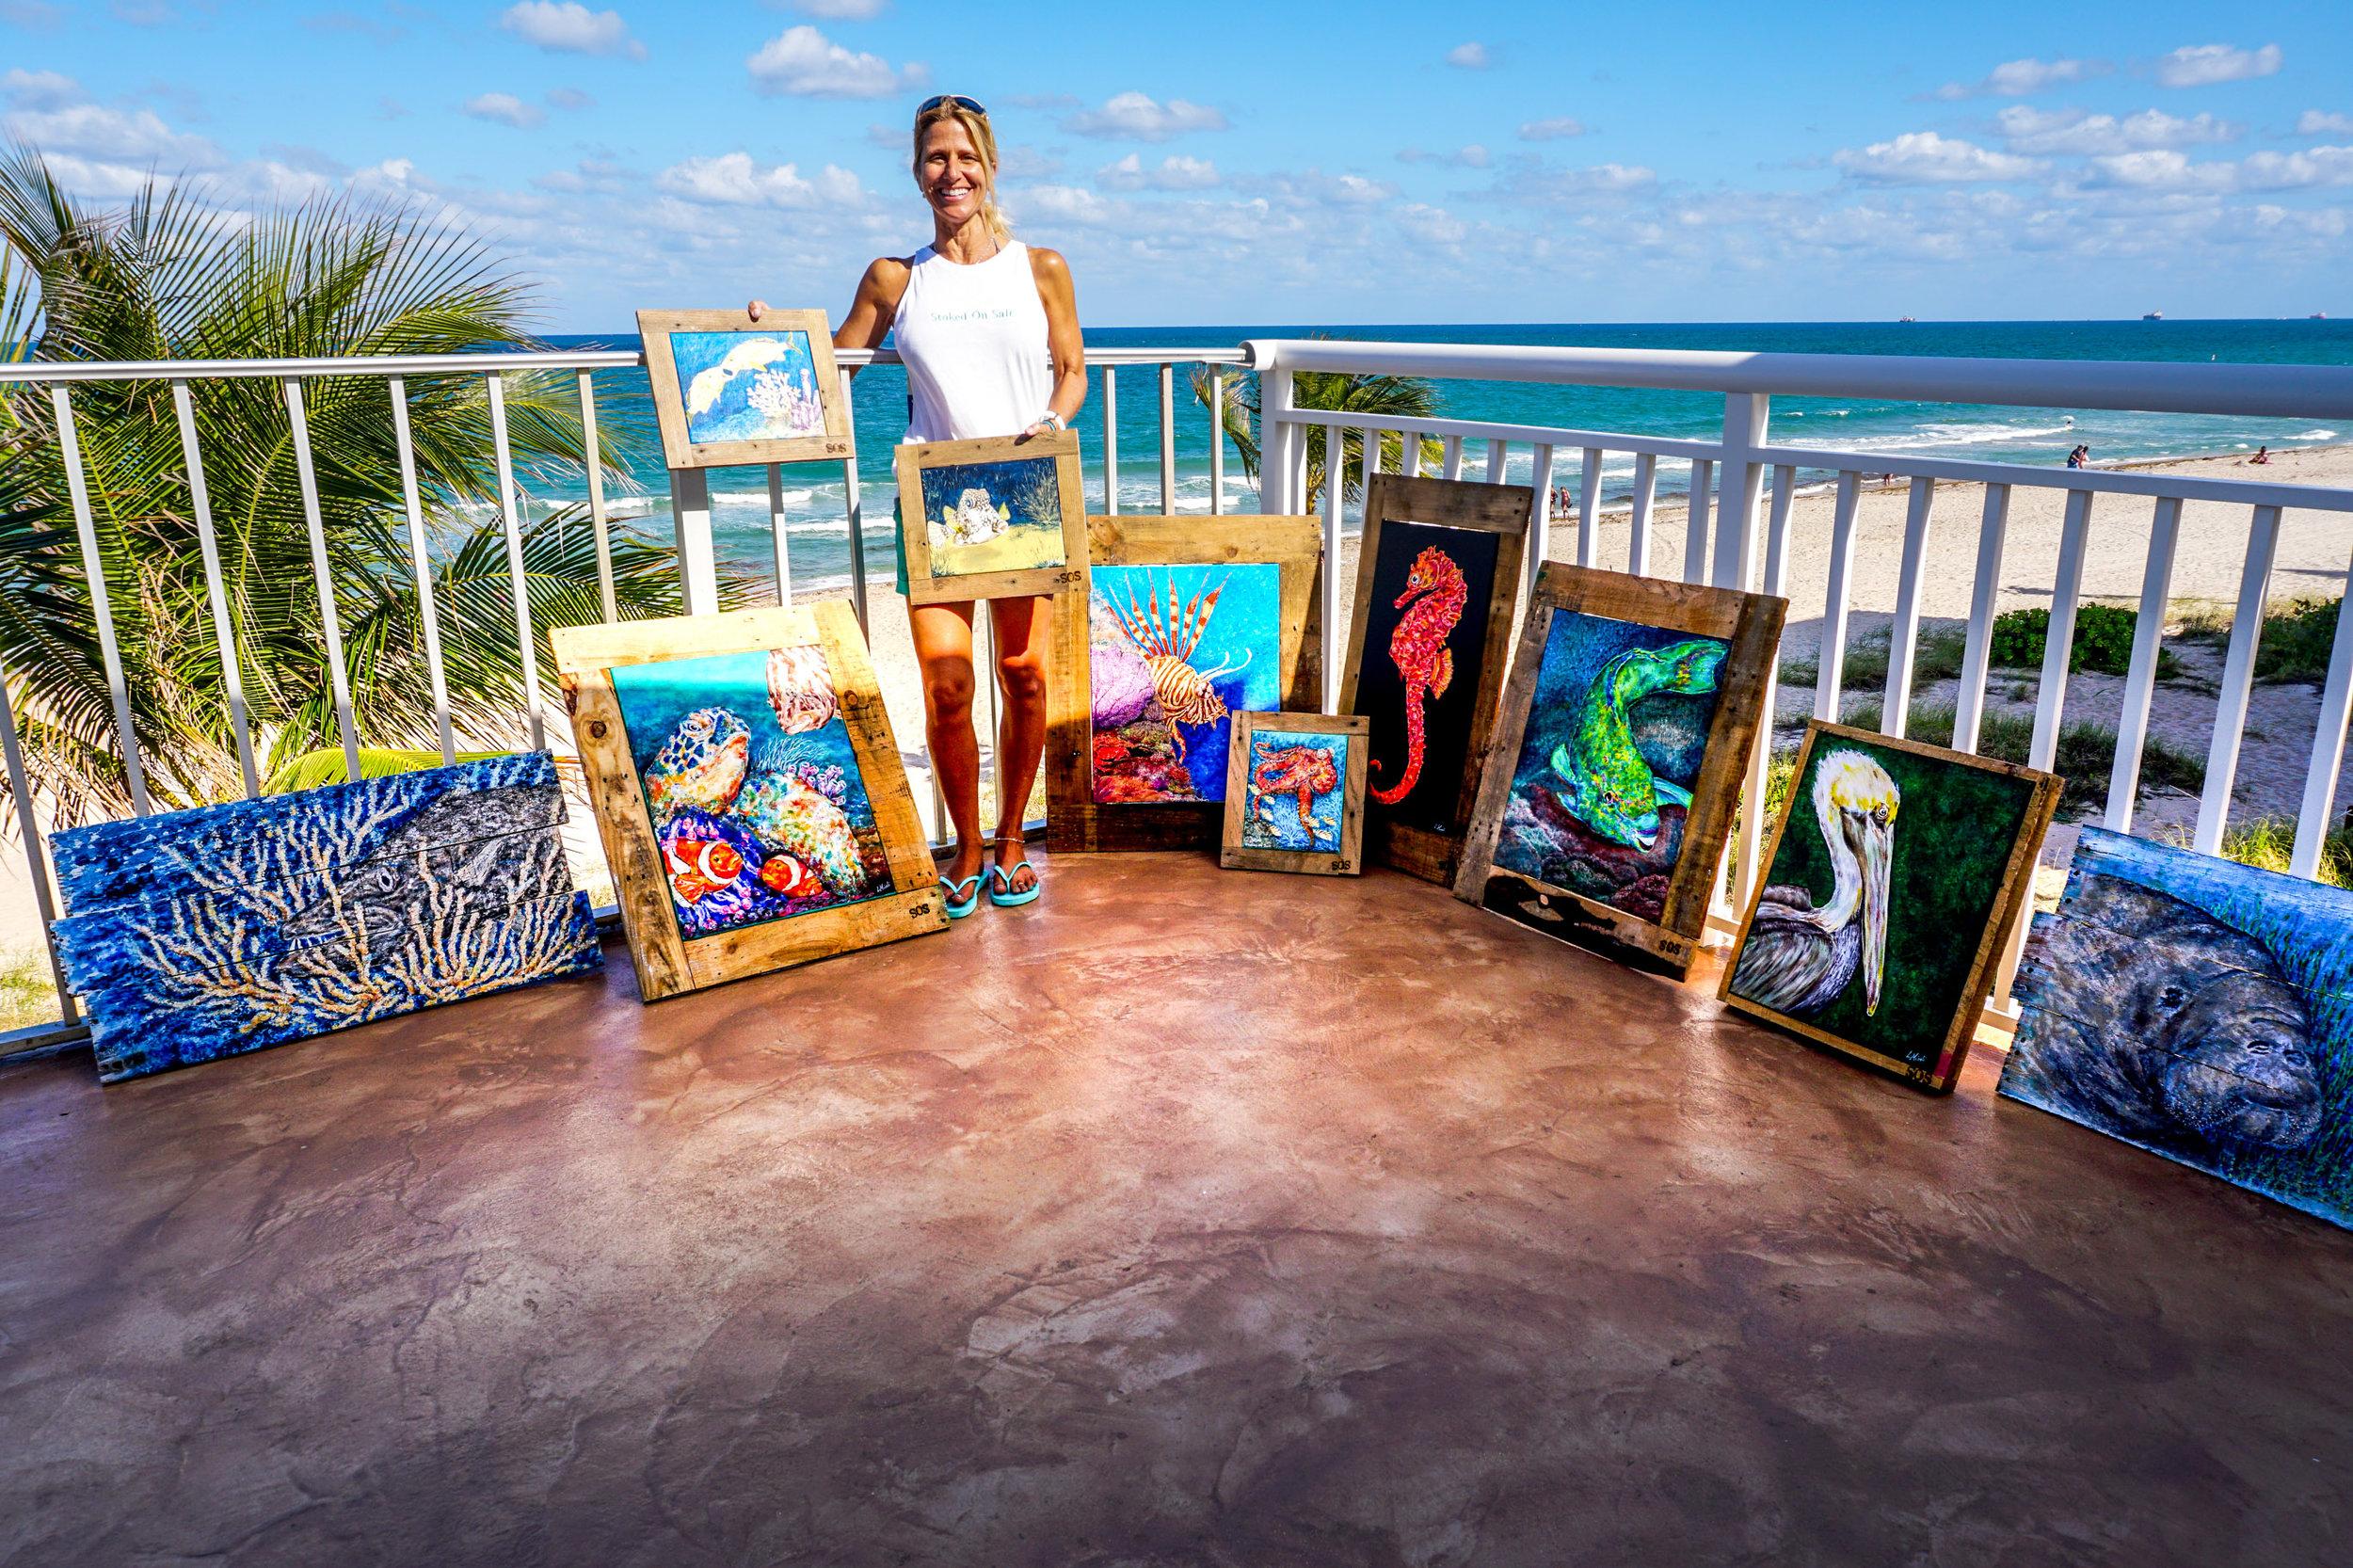 olapi-creative-blue-business-spotlight-sos-lisa-miceli-all-paintings